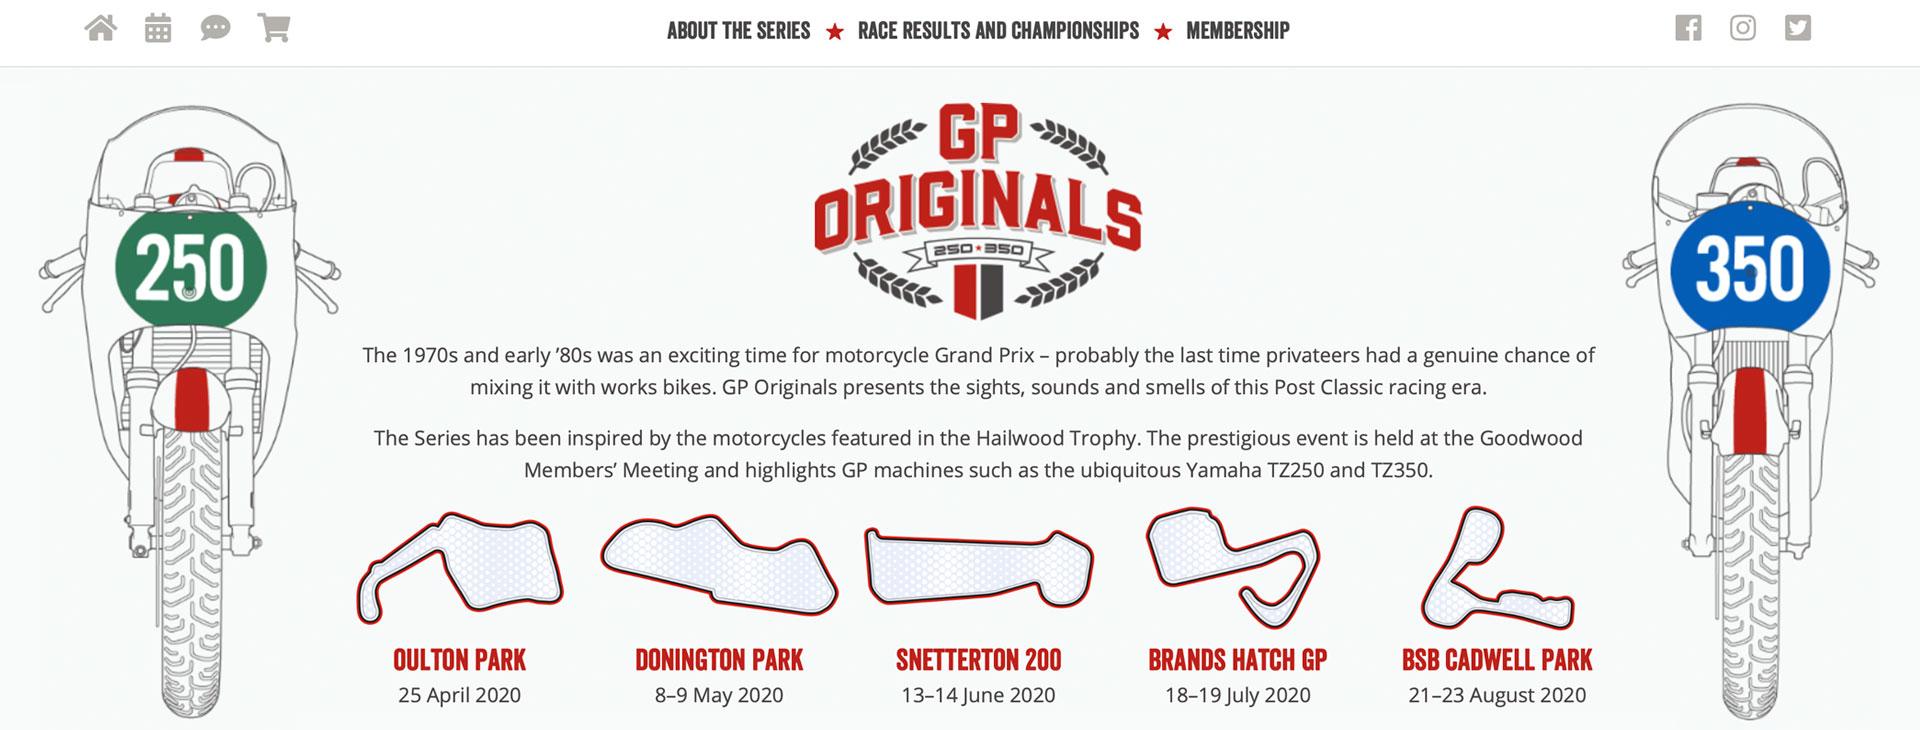 GP Originals bespoke WordPress theme designed by Spyre Limited